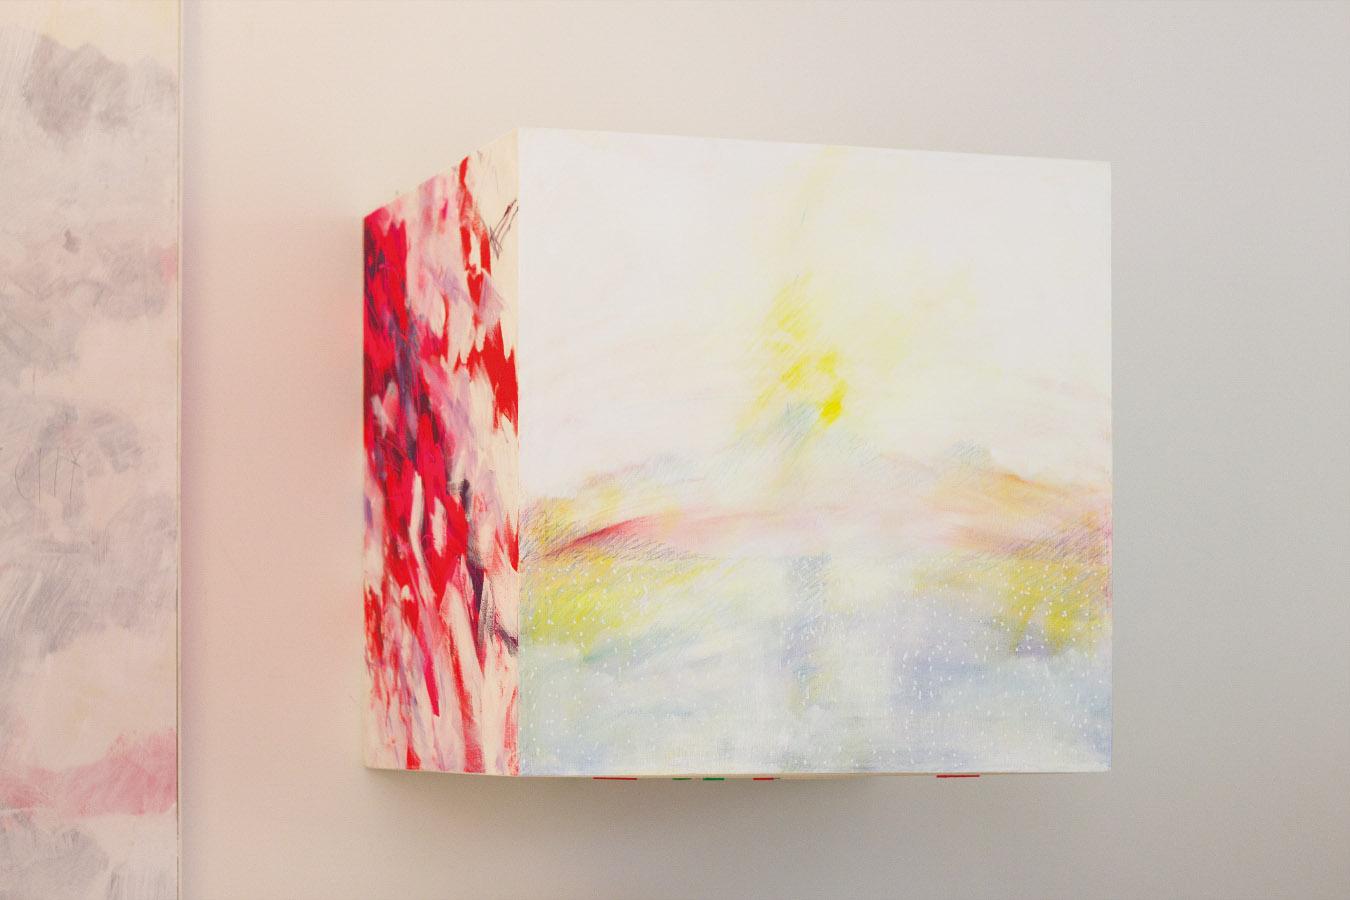 Fivesenses (Cubo) Sight, acrylic, graphite, plexiglass, pigment, plastic mesh on canvas, 80x80x80 cm